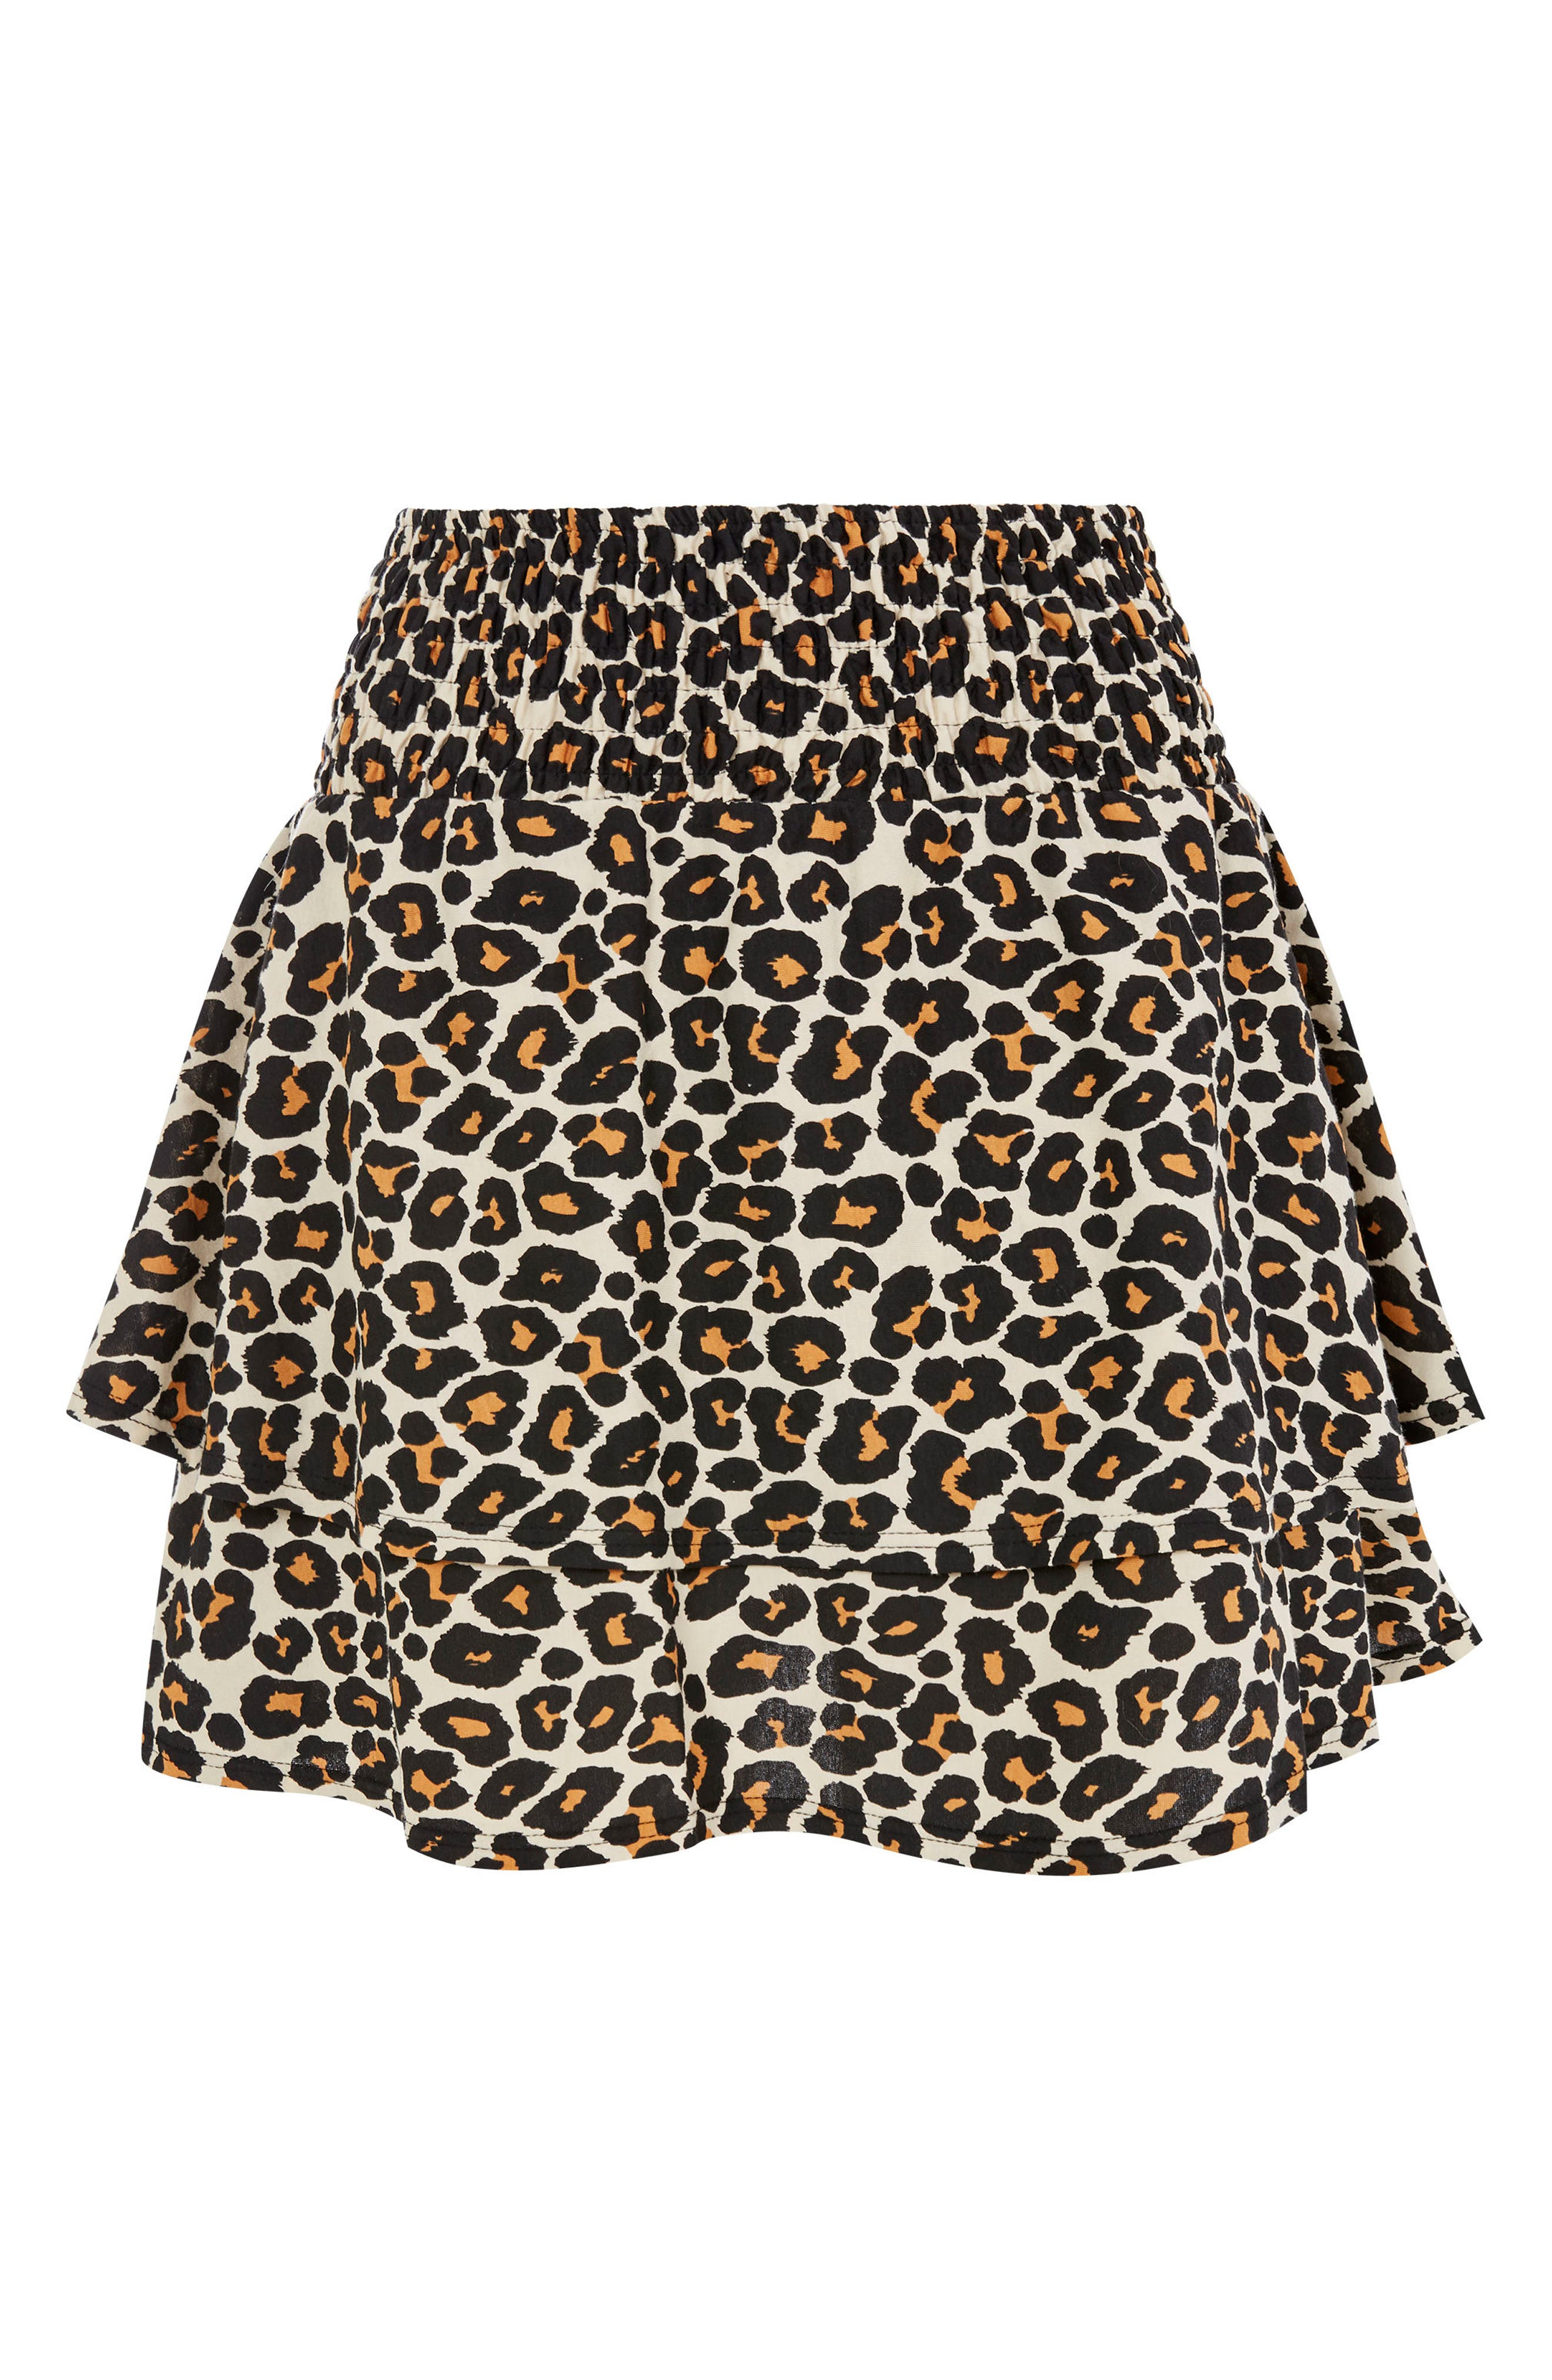 Tiered Leopard Skirt,                             Alternate thumbnail 3, color,                             Leopard